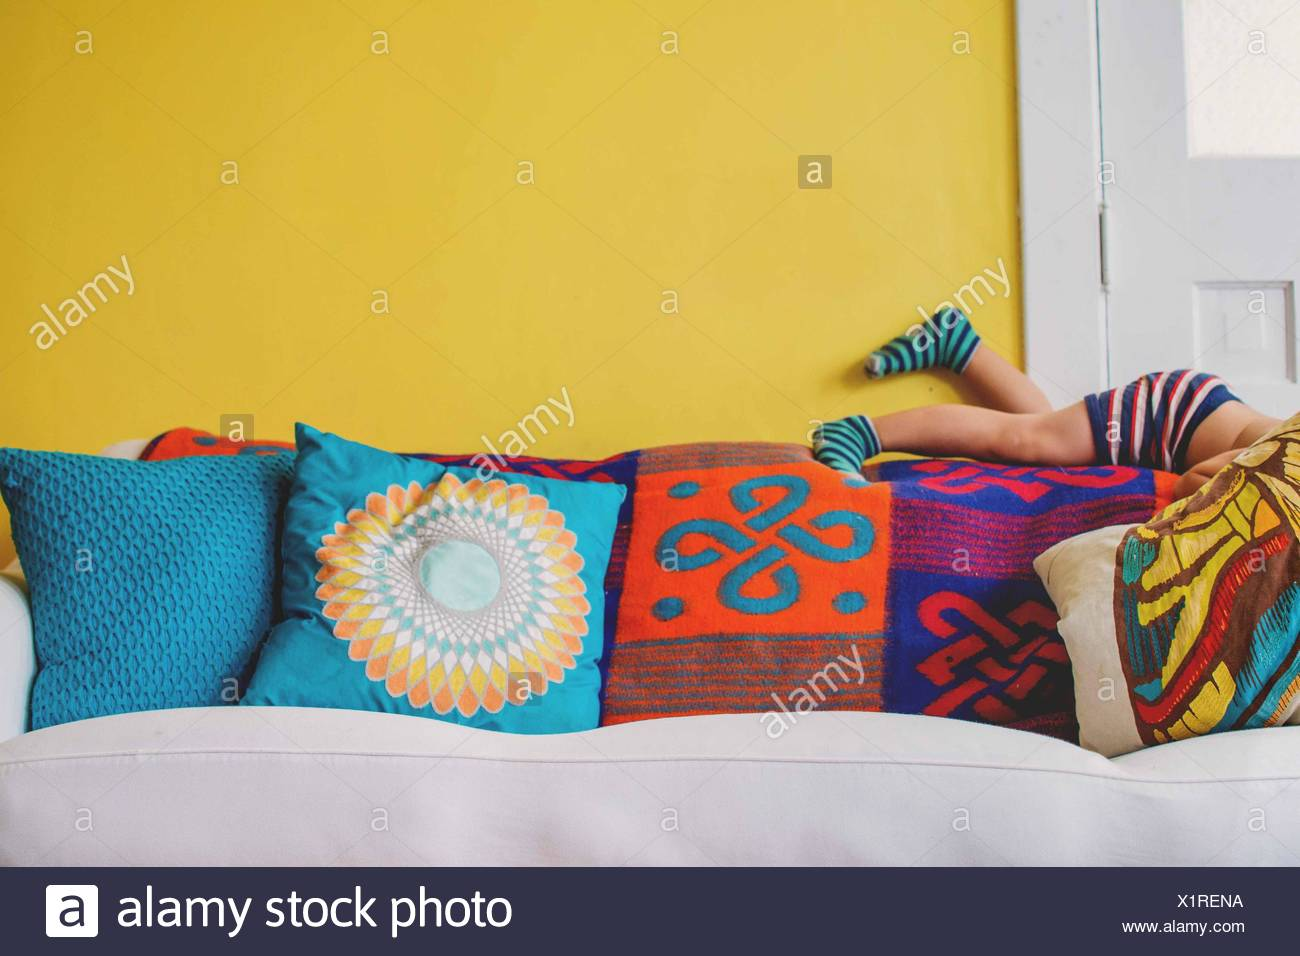 Yellow Wall Sofa Stock Photos & Yellow Wall Sofa Stock Images - Alamy